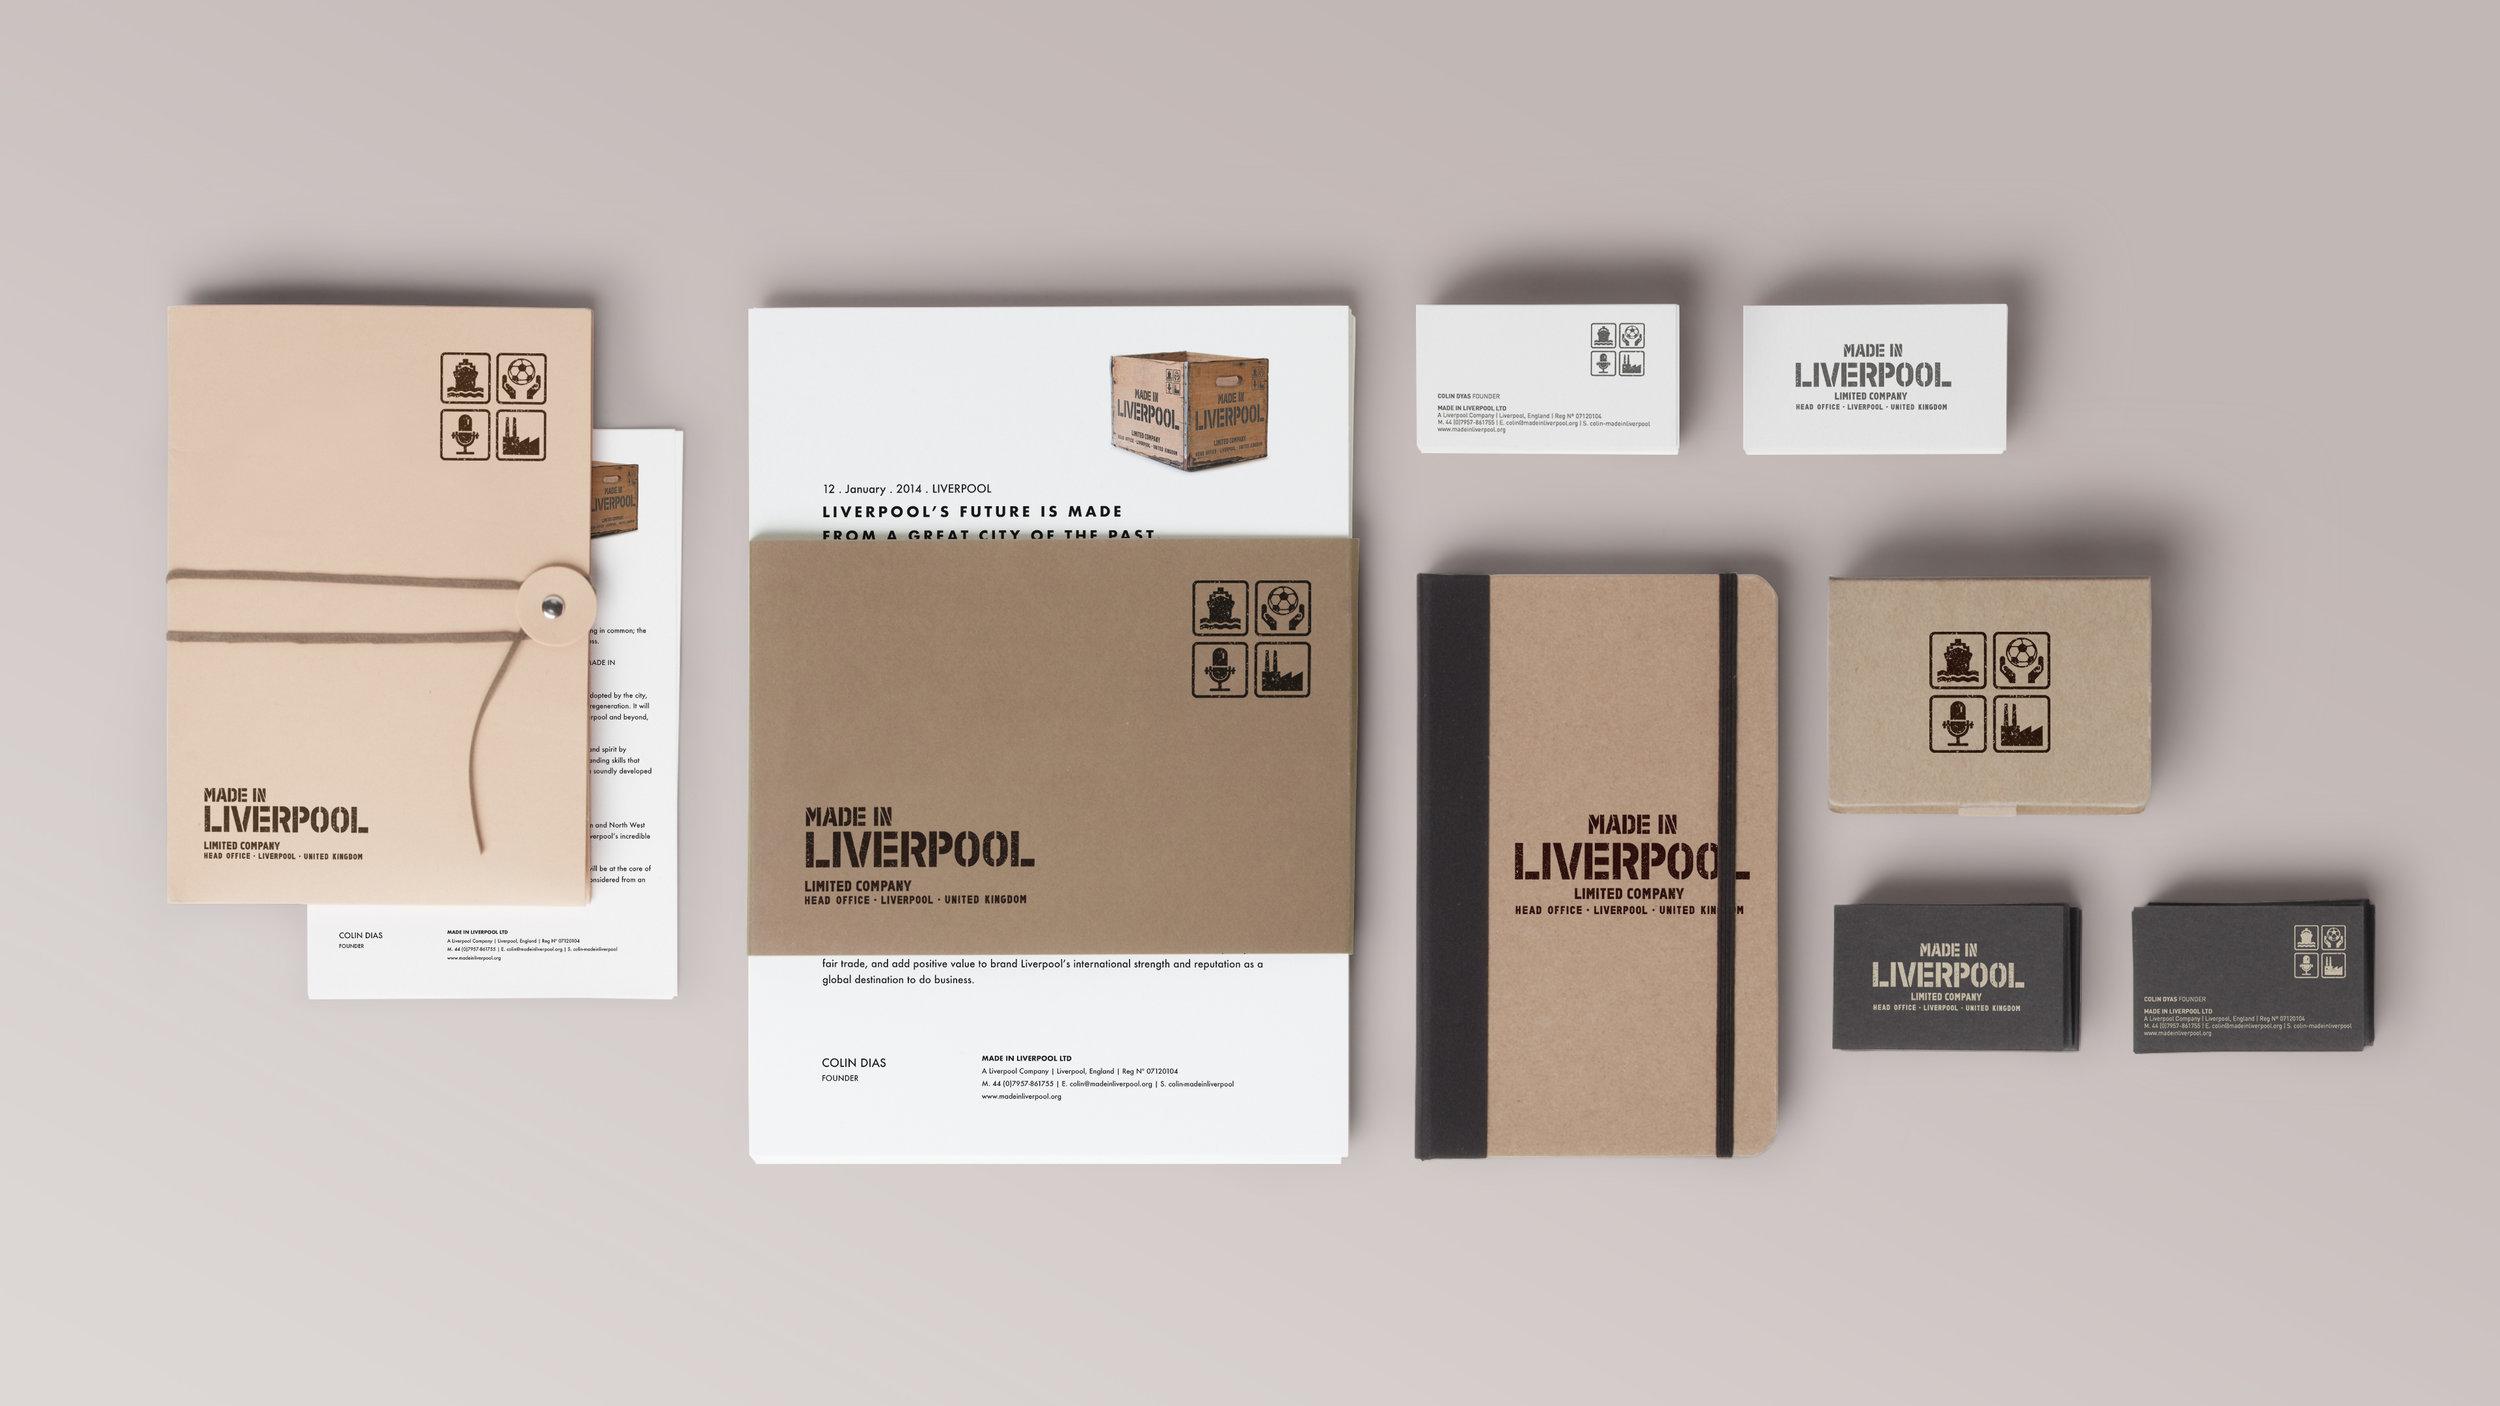 Brand_republica_Made_In_Liverpool_stationery_design_01.jpg